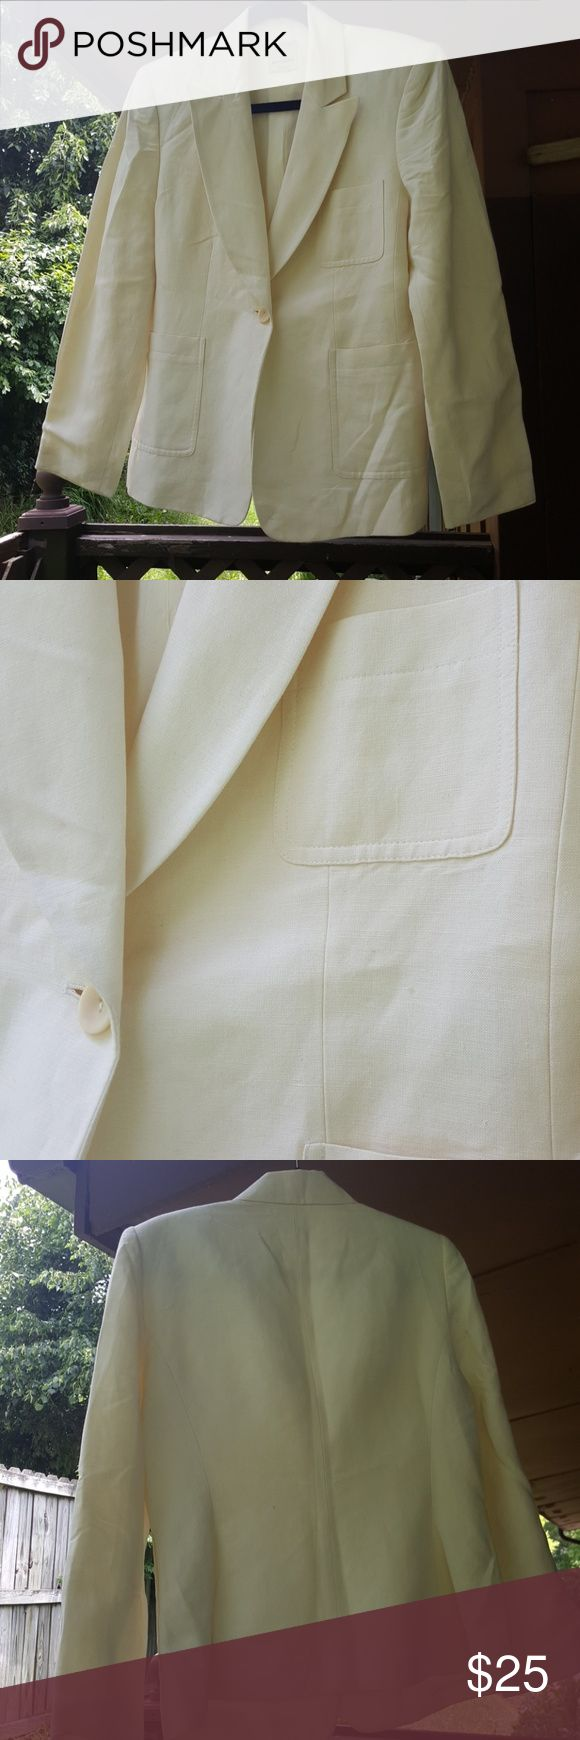 Anne Klein 2 petite blazer/jacket. 55 % Linen 45% rayon blazer/jacket. Off white color.   Size 10 P. Anne Kline  Jackets & Coats Blazers